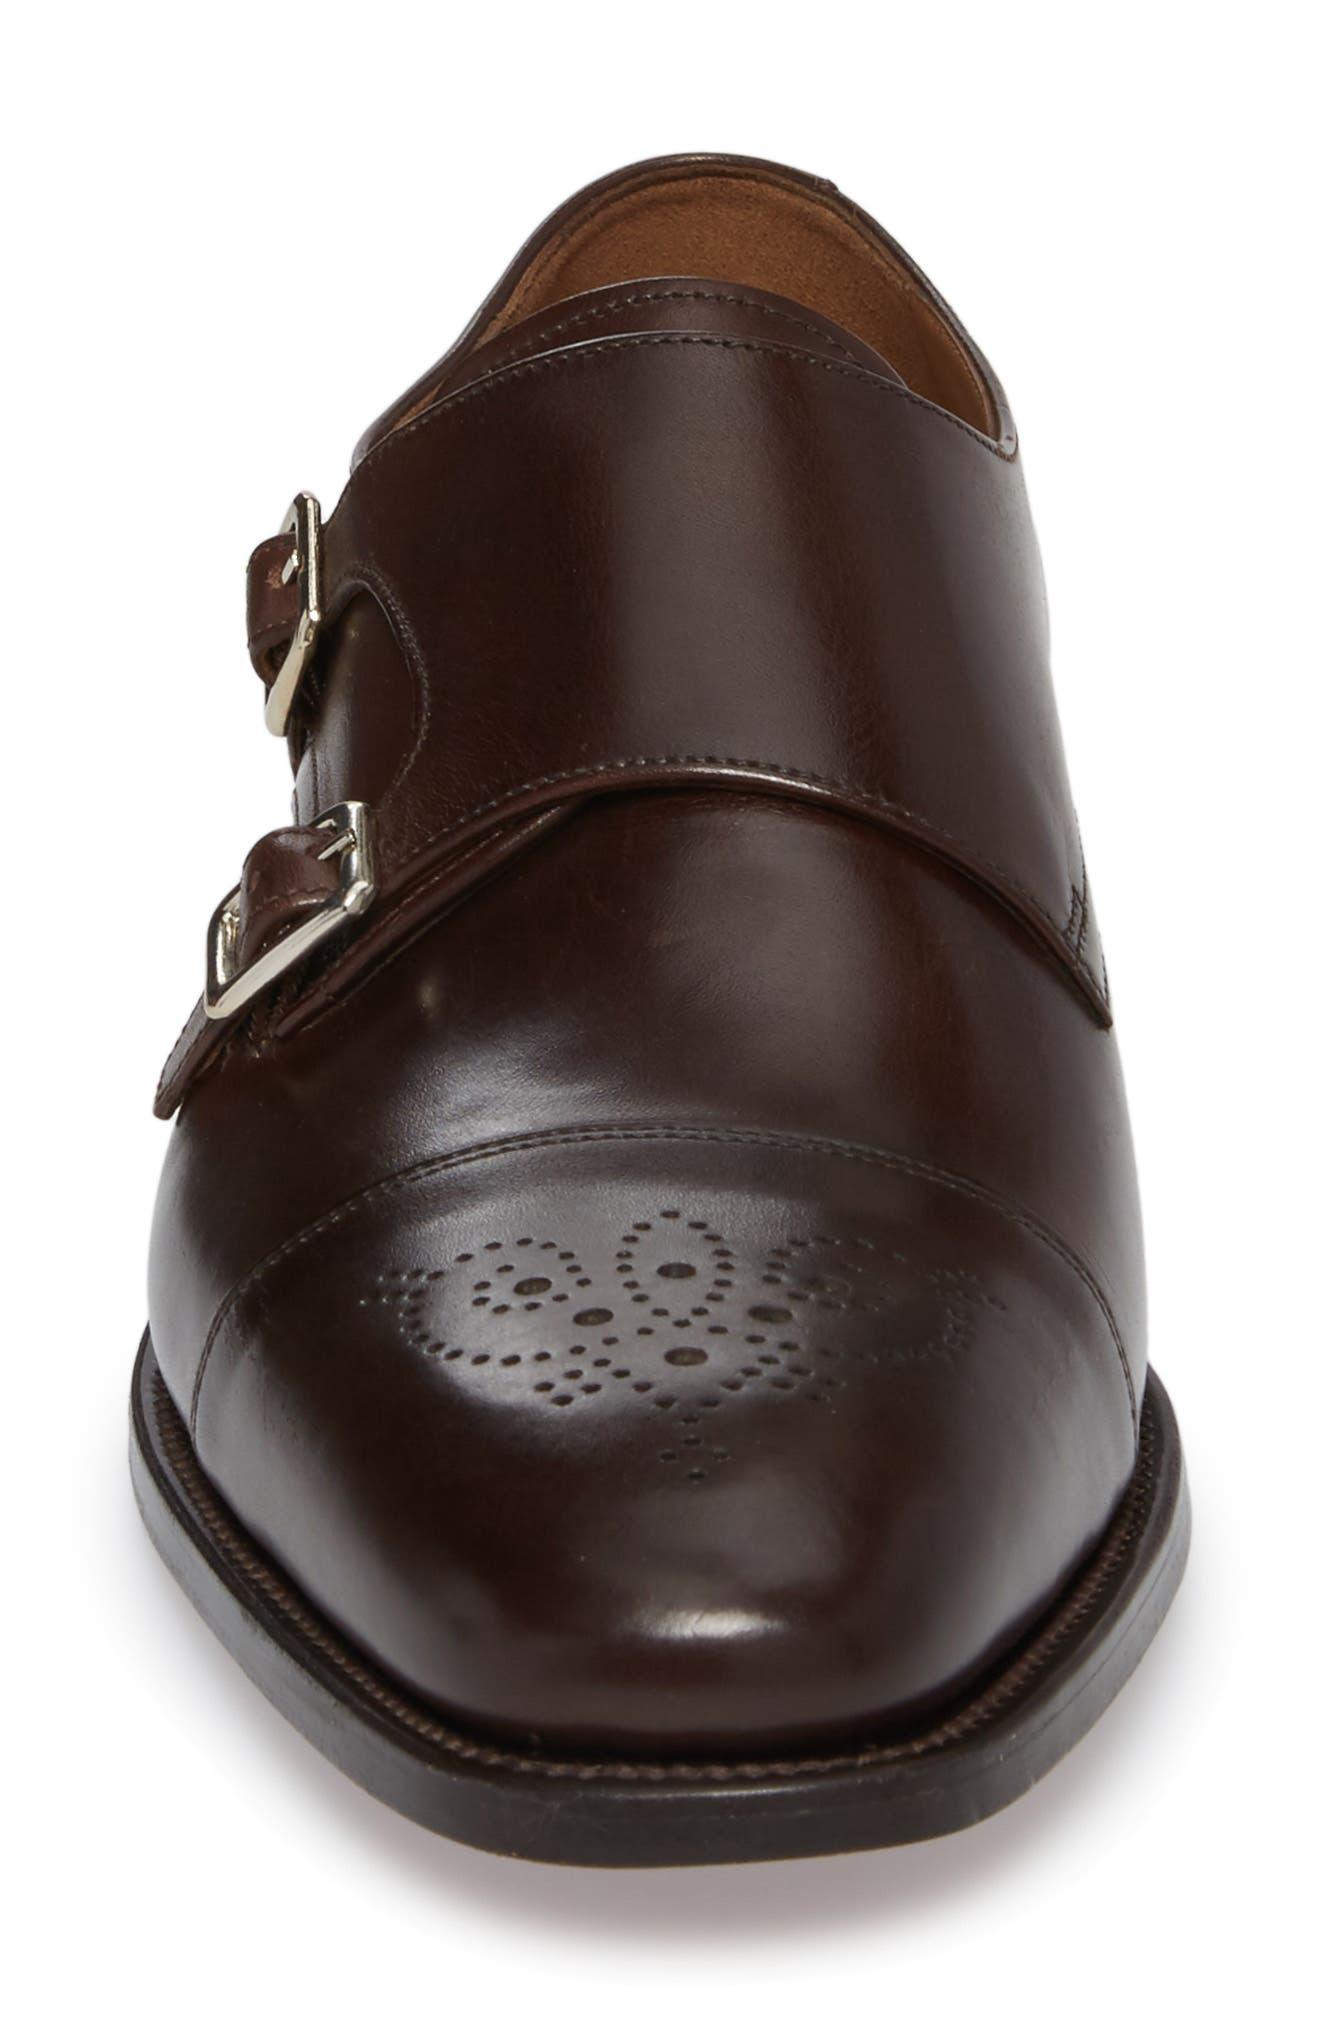 Sausalito Double Monk Strap Shoe,                             Alternate thumbnail 4, color,                             COFFEE